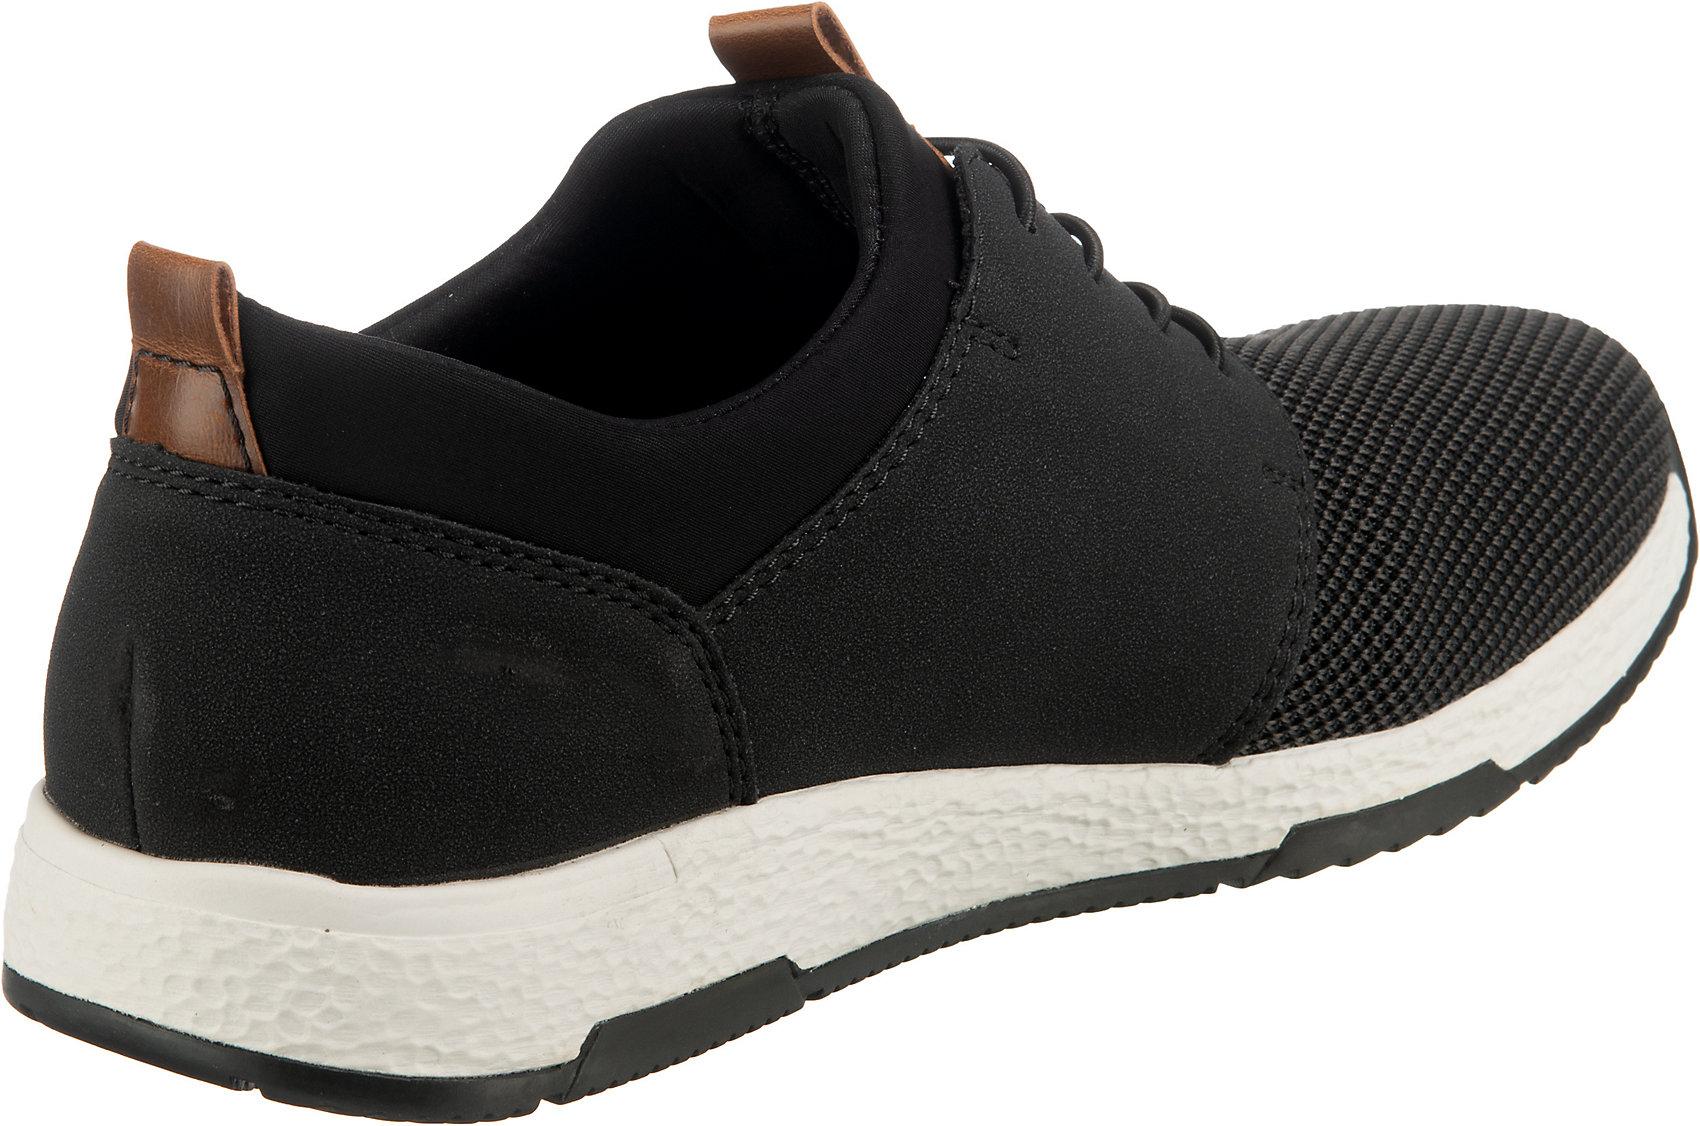 Indexbild 5 - Neu rieker Sneakers Low 12842477 für Herren schwarz